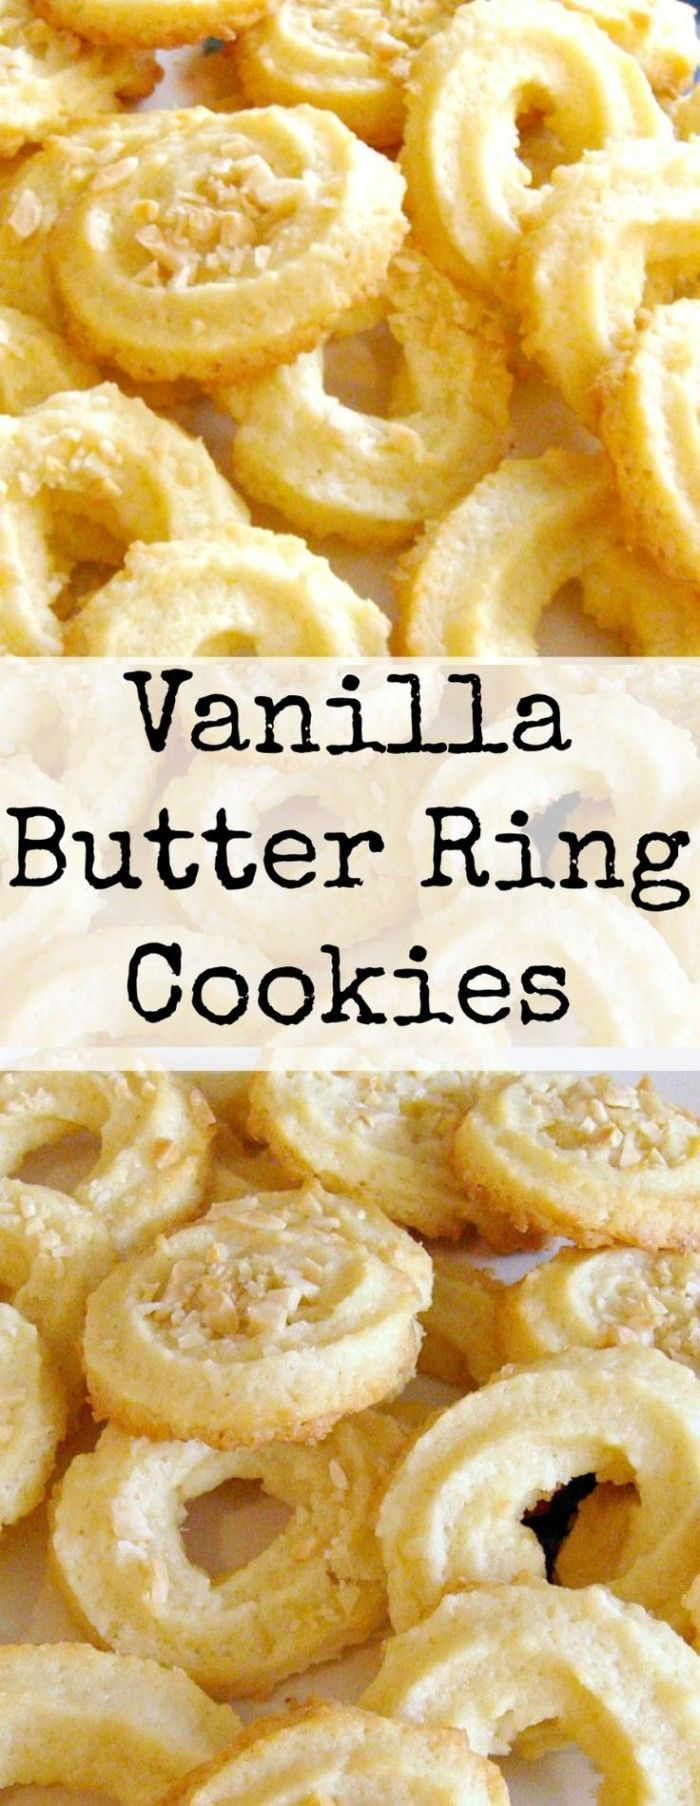 VANILLA BUTTER RING COOKIES   Tastefulonly